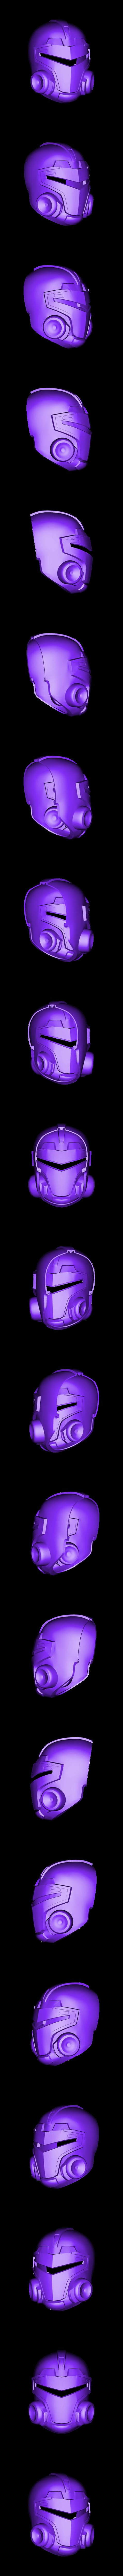 Blood_Dragon_Helmet_v4.stl Download free STL file  Blood Dragon Helmet Mass Effect 2 (With Back Access) • 3D printable template, VillainousPropShop